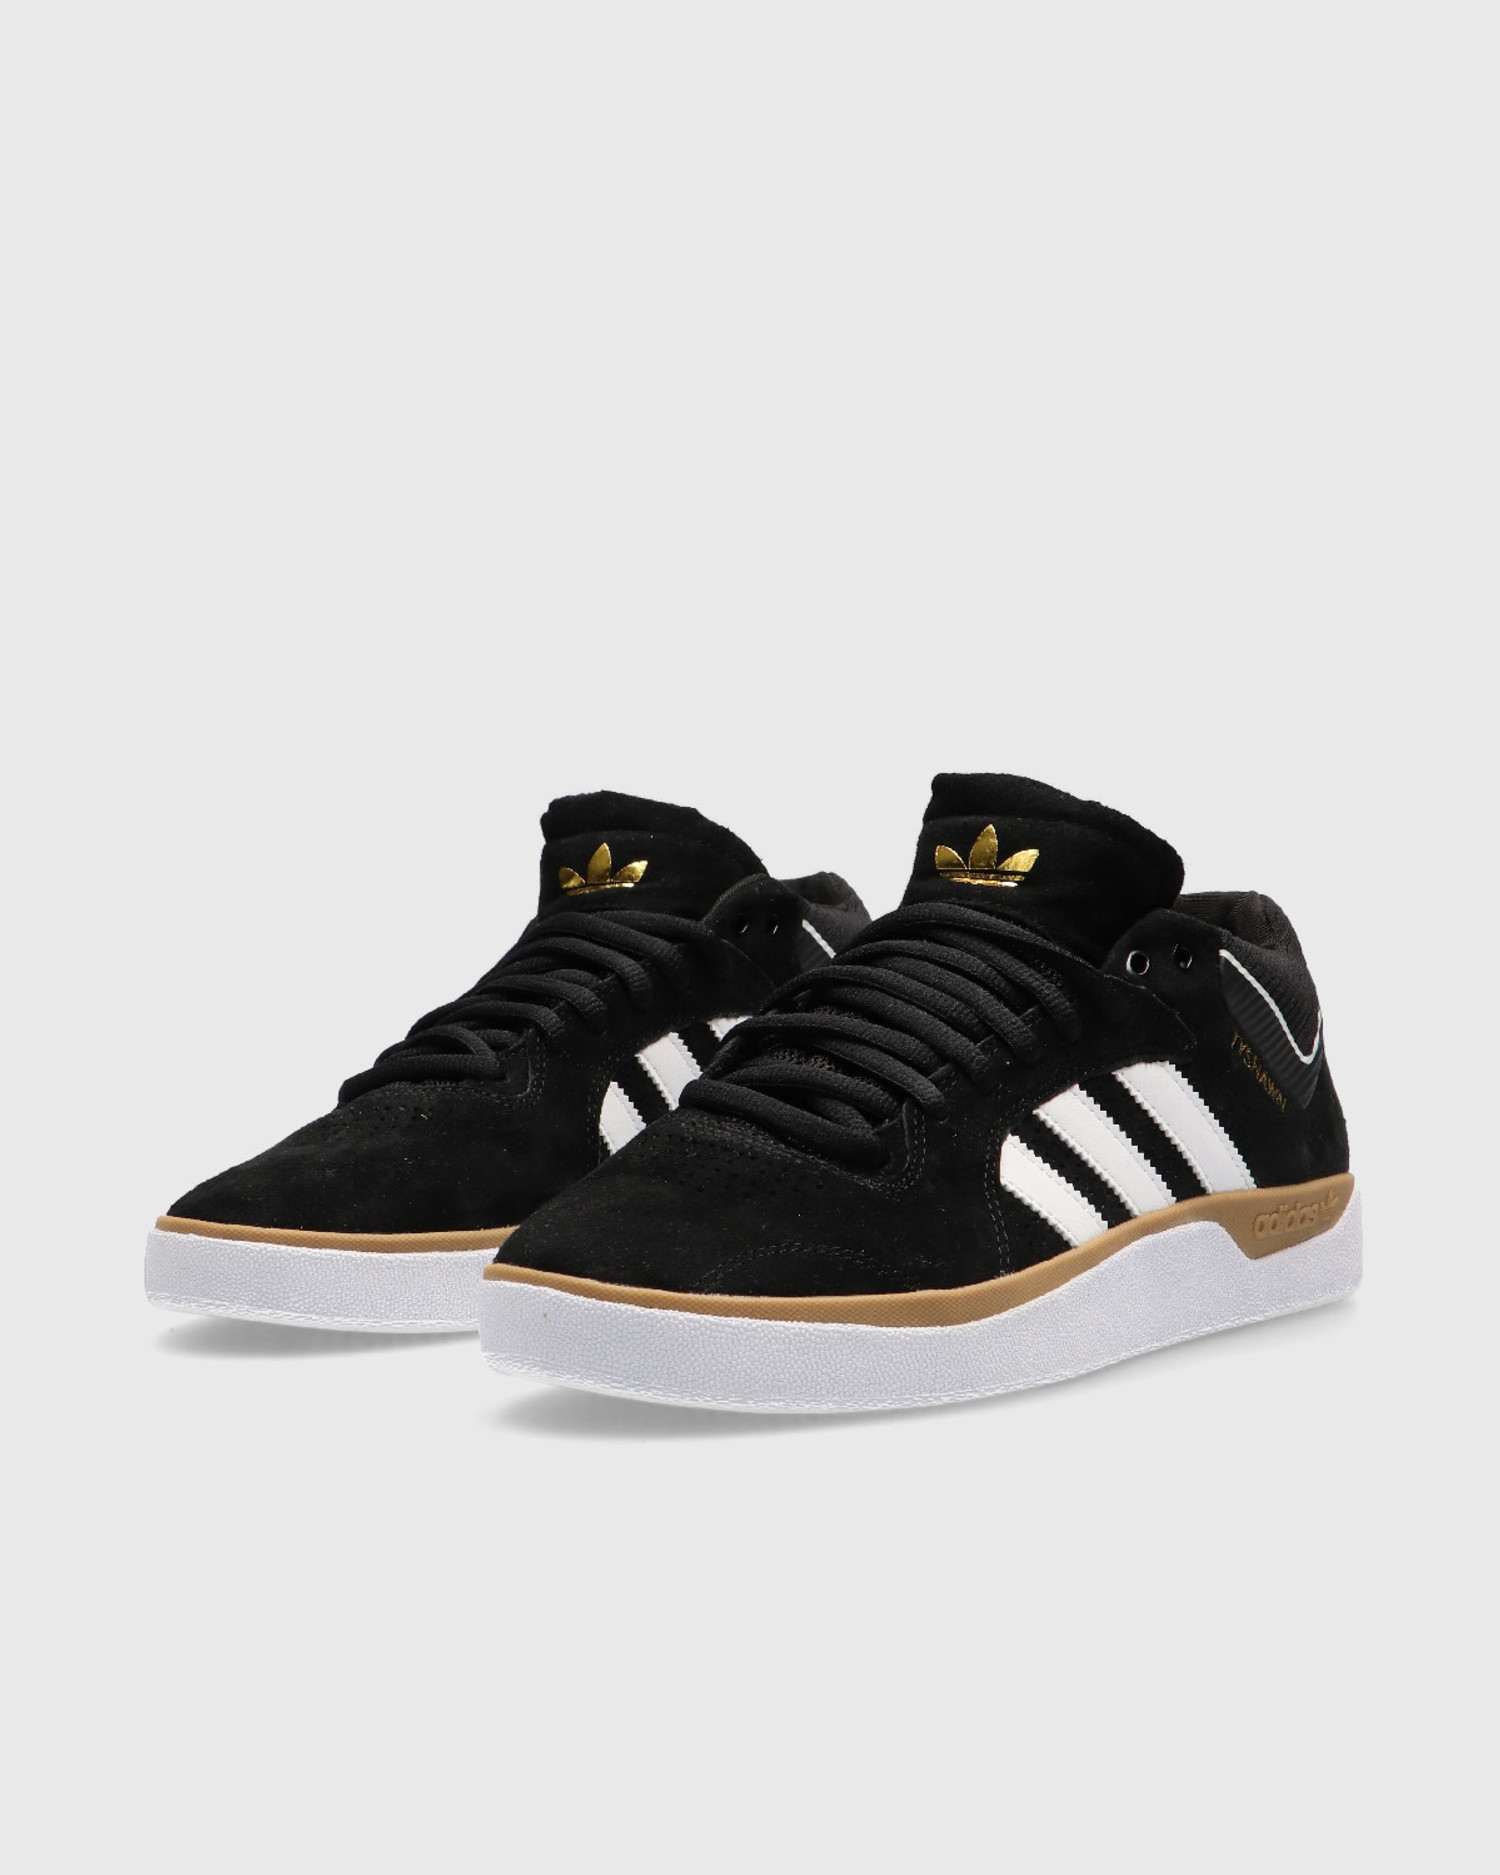 Adidas Skateboarding Tyshawn Black/White/Gum